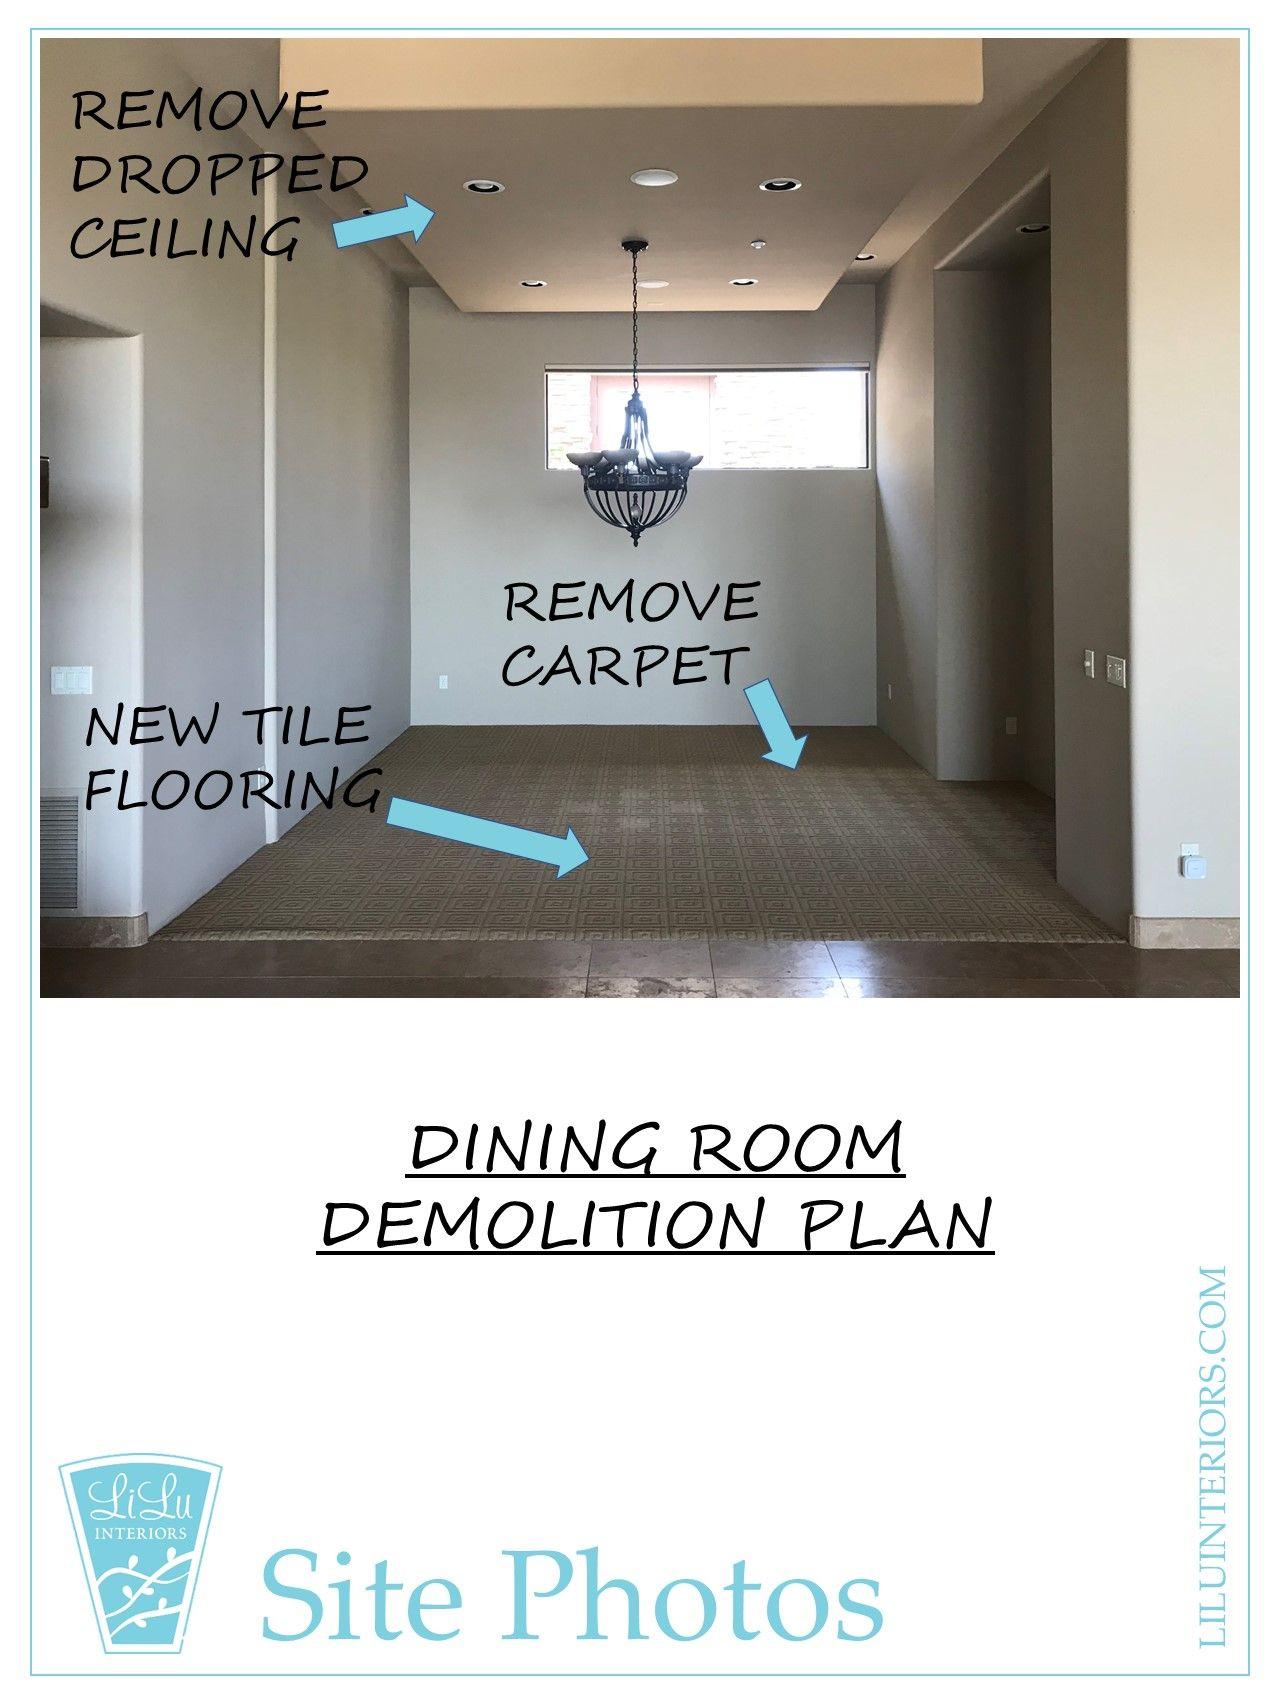 Arizona Gem Remodel SEE ALL THE DESIGN IDEAS IN BLOG #interiordesign #remodel #arizona #minneapolis #diningroomremodel #interiordesignideas #homedesign #interiordecor #homedesignideas #interiorinspiration #homedecor #customdesign #customhome #homeremodel